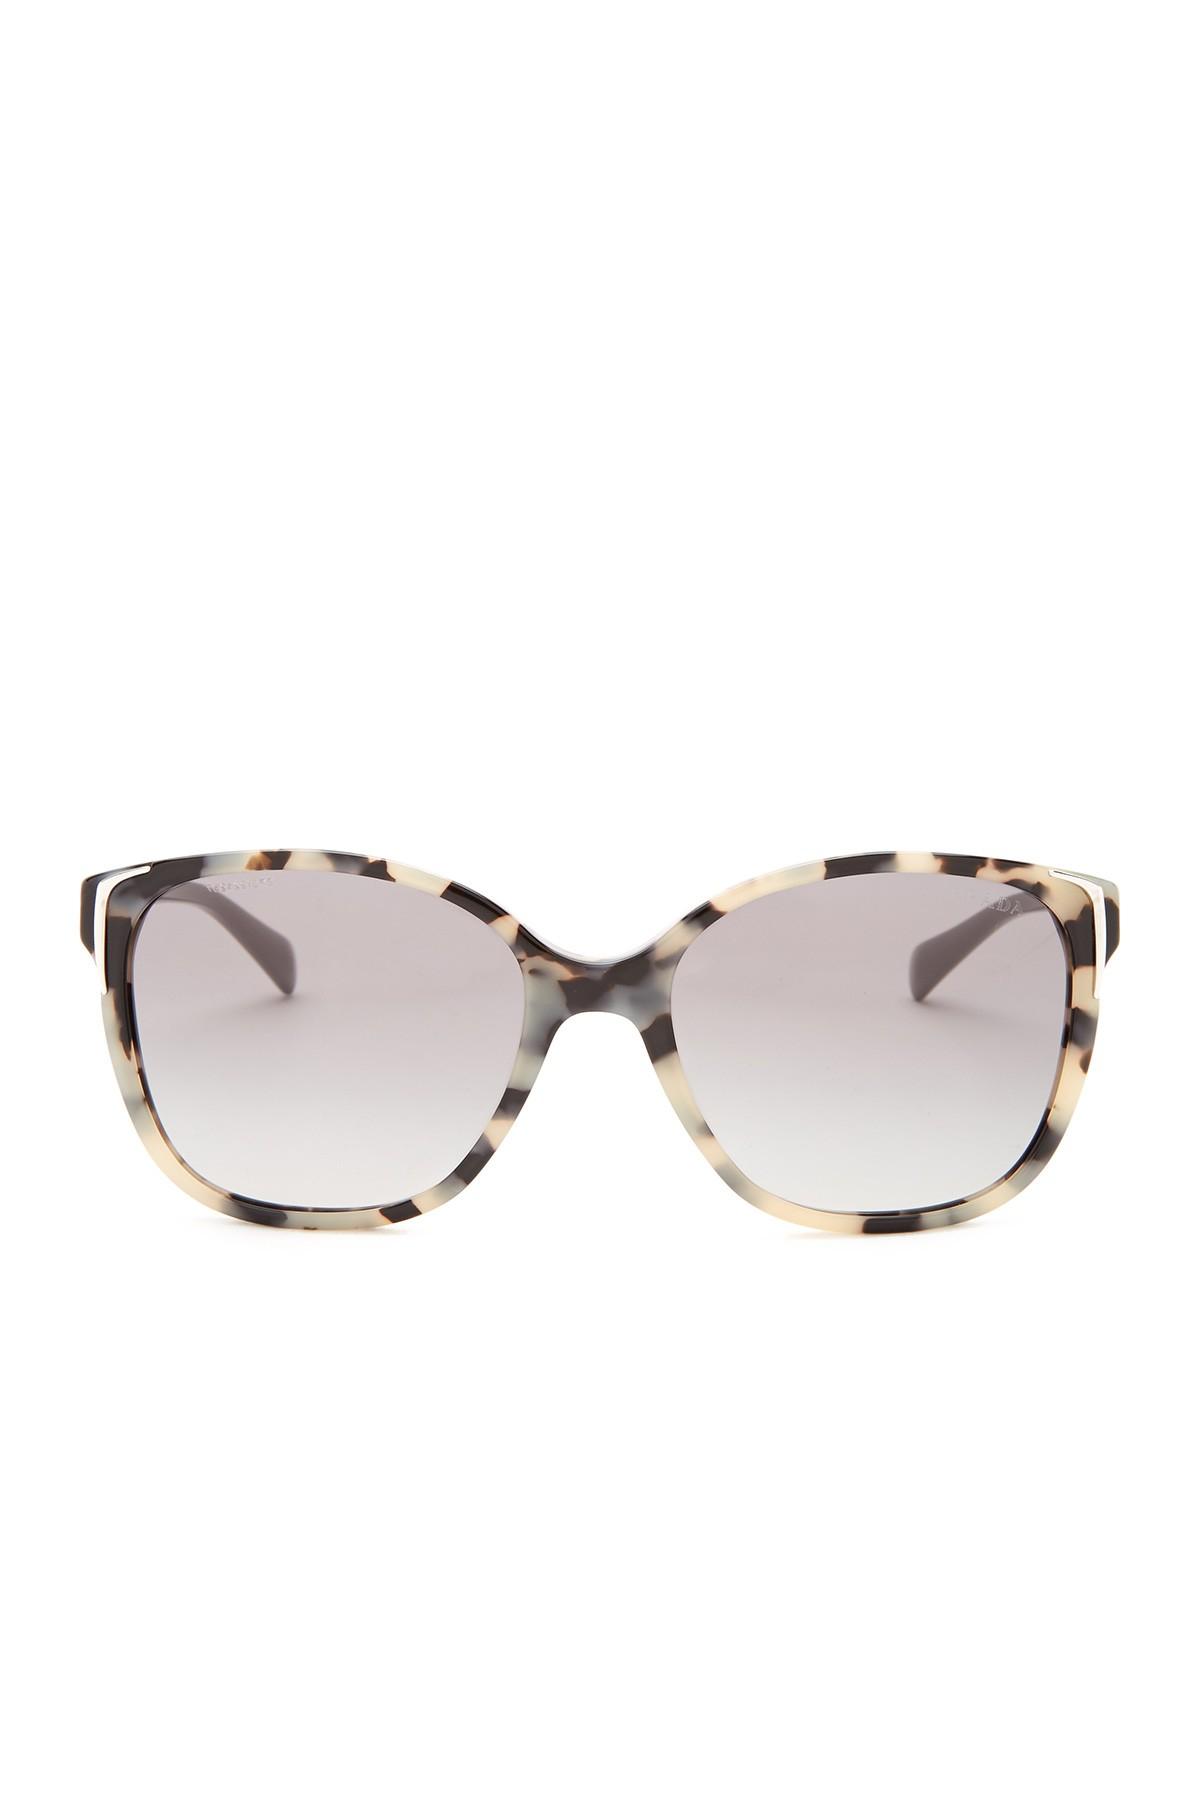 c67c9553d96 Nordstrom Rack Chanel Sunglasses - Bitterroot Public Library